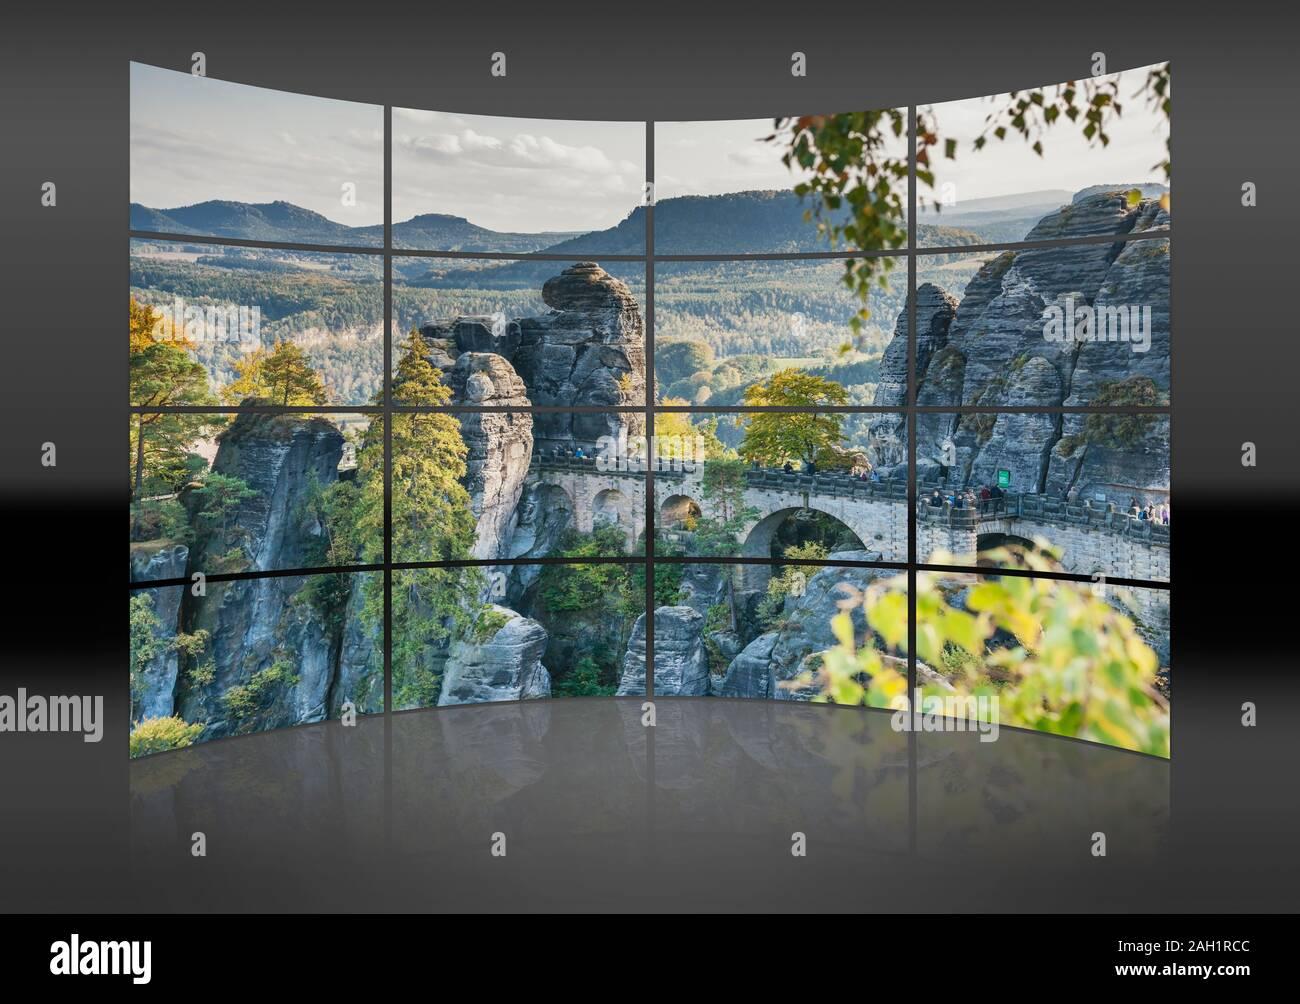 View from Ferdinand stone to the spectacular rock formation Bastei (Bastion) and Bastei Bridge, Saxony, Germany, Europe Stock Photo